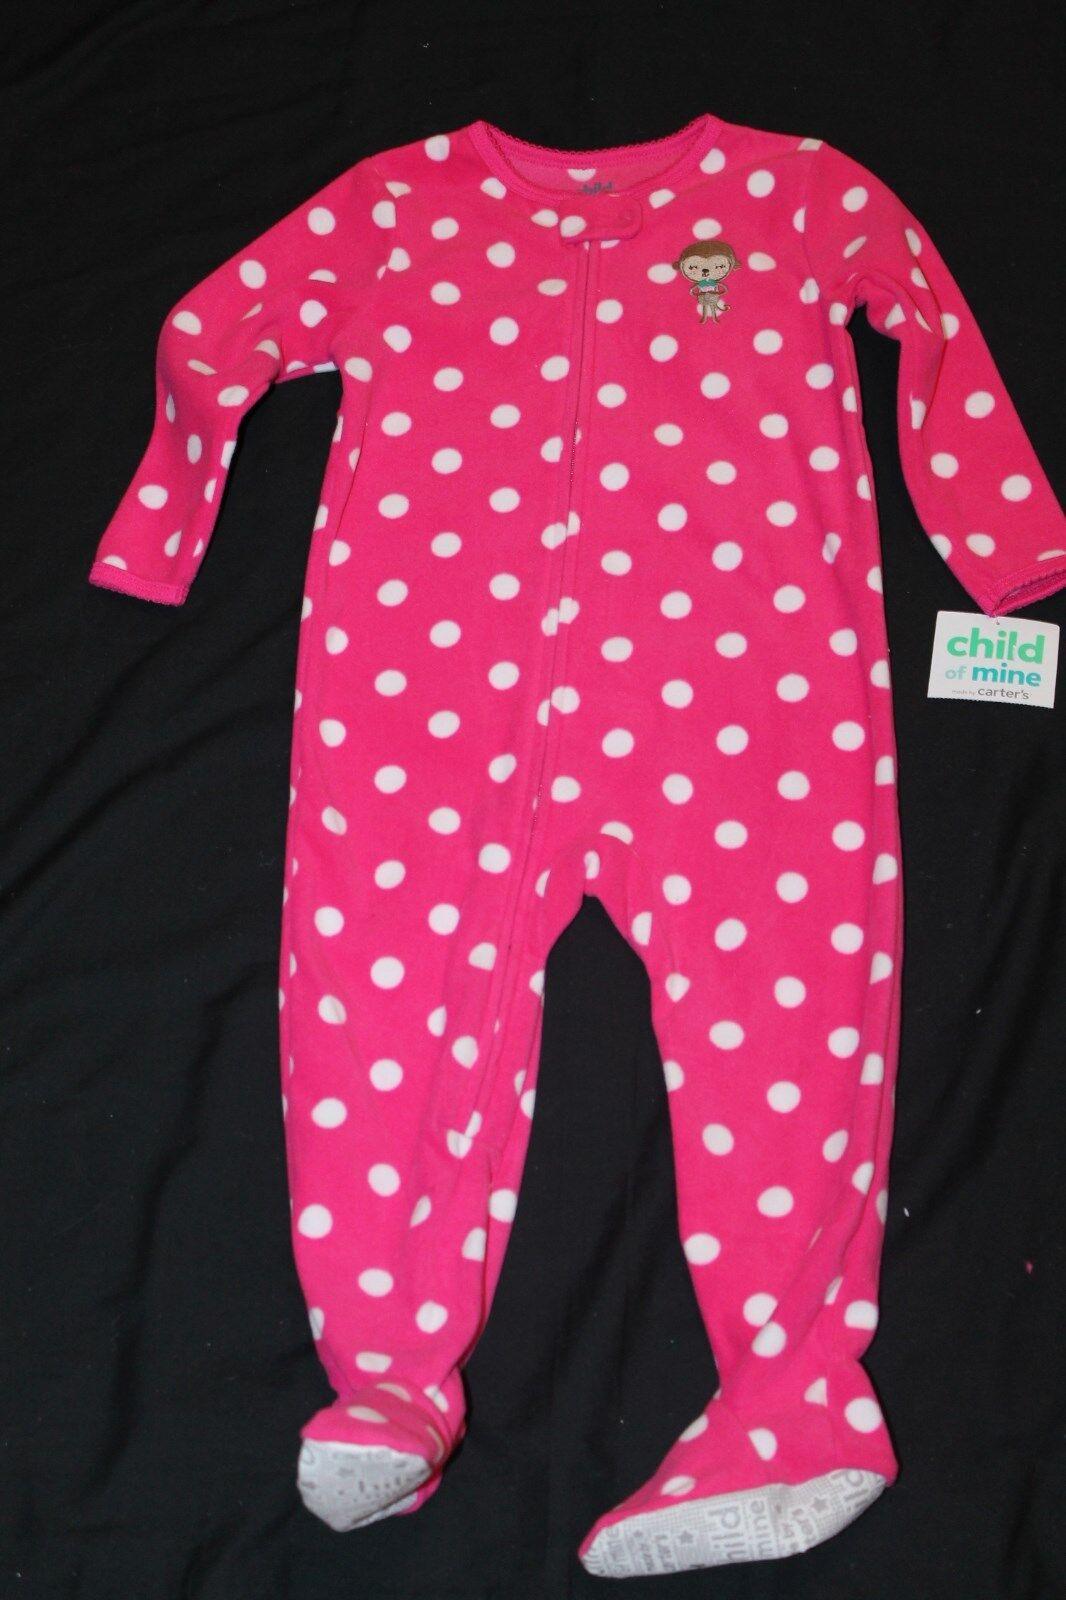 10a3b5f9d09c Two 24m Carter s Child of Mine Girls Sleeper Pajamas Fleece Footed ...